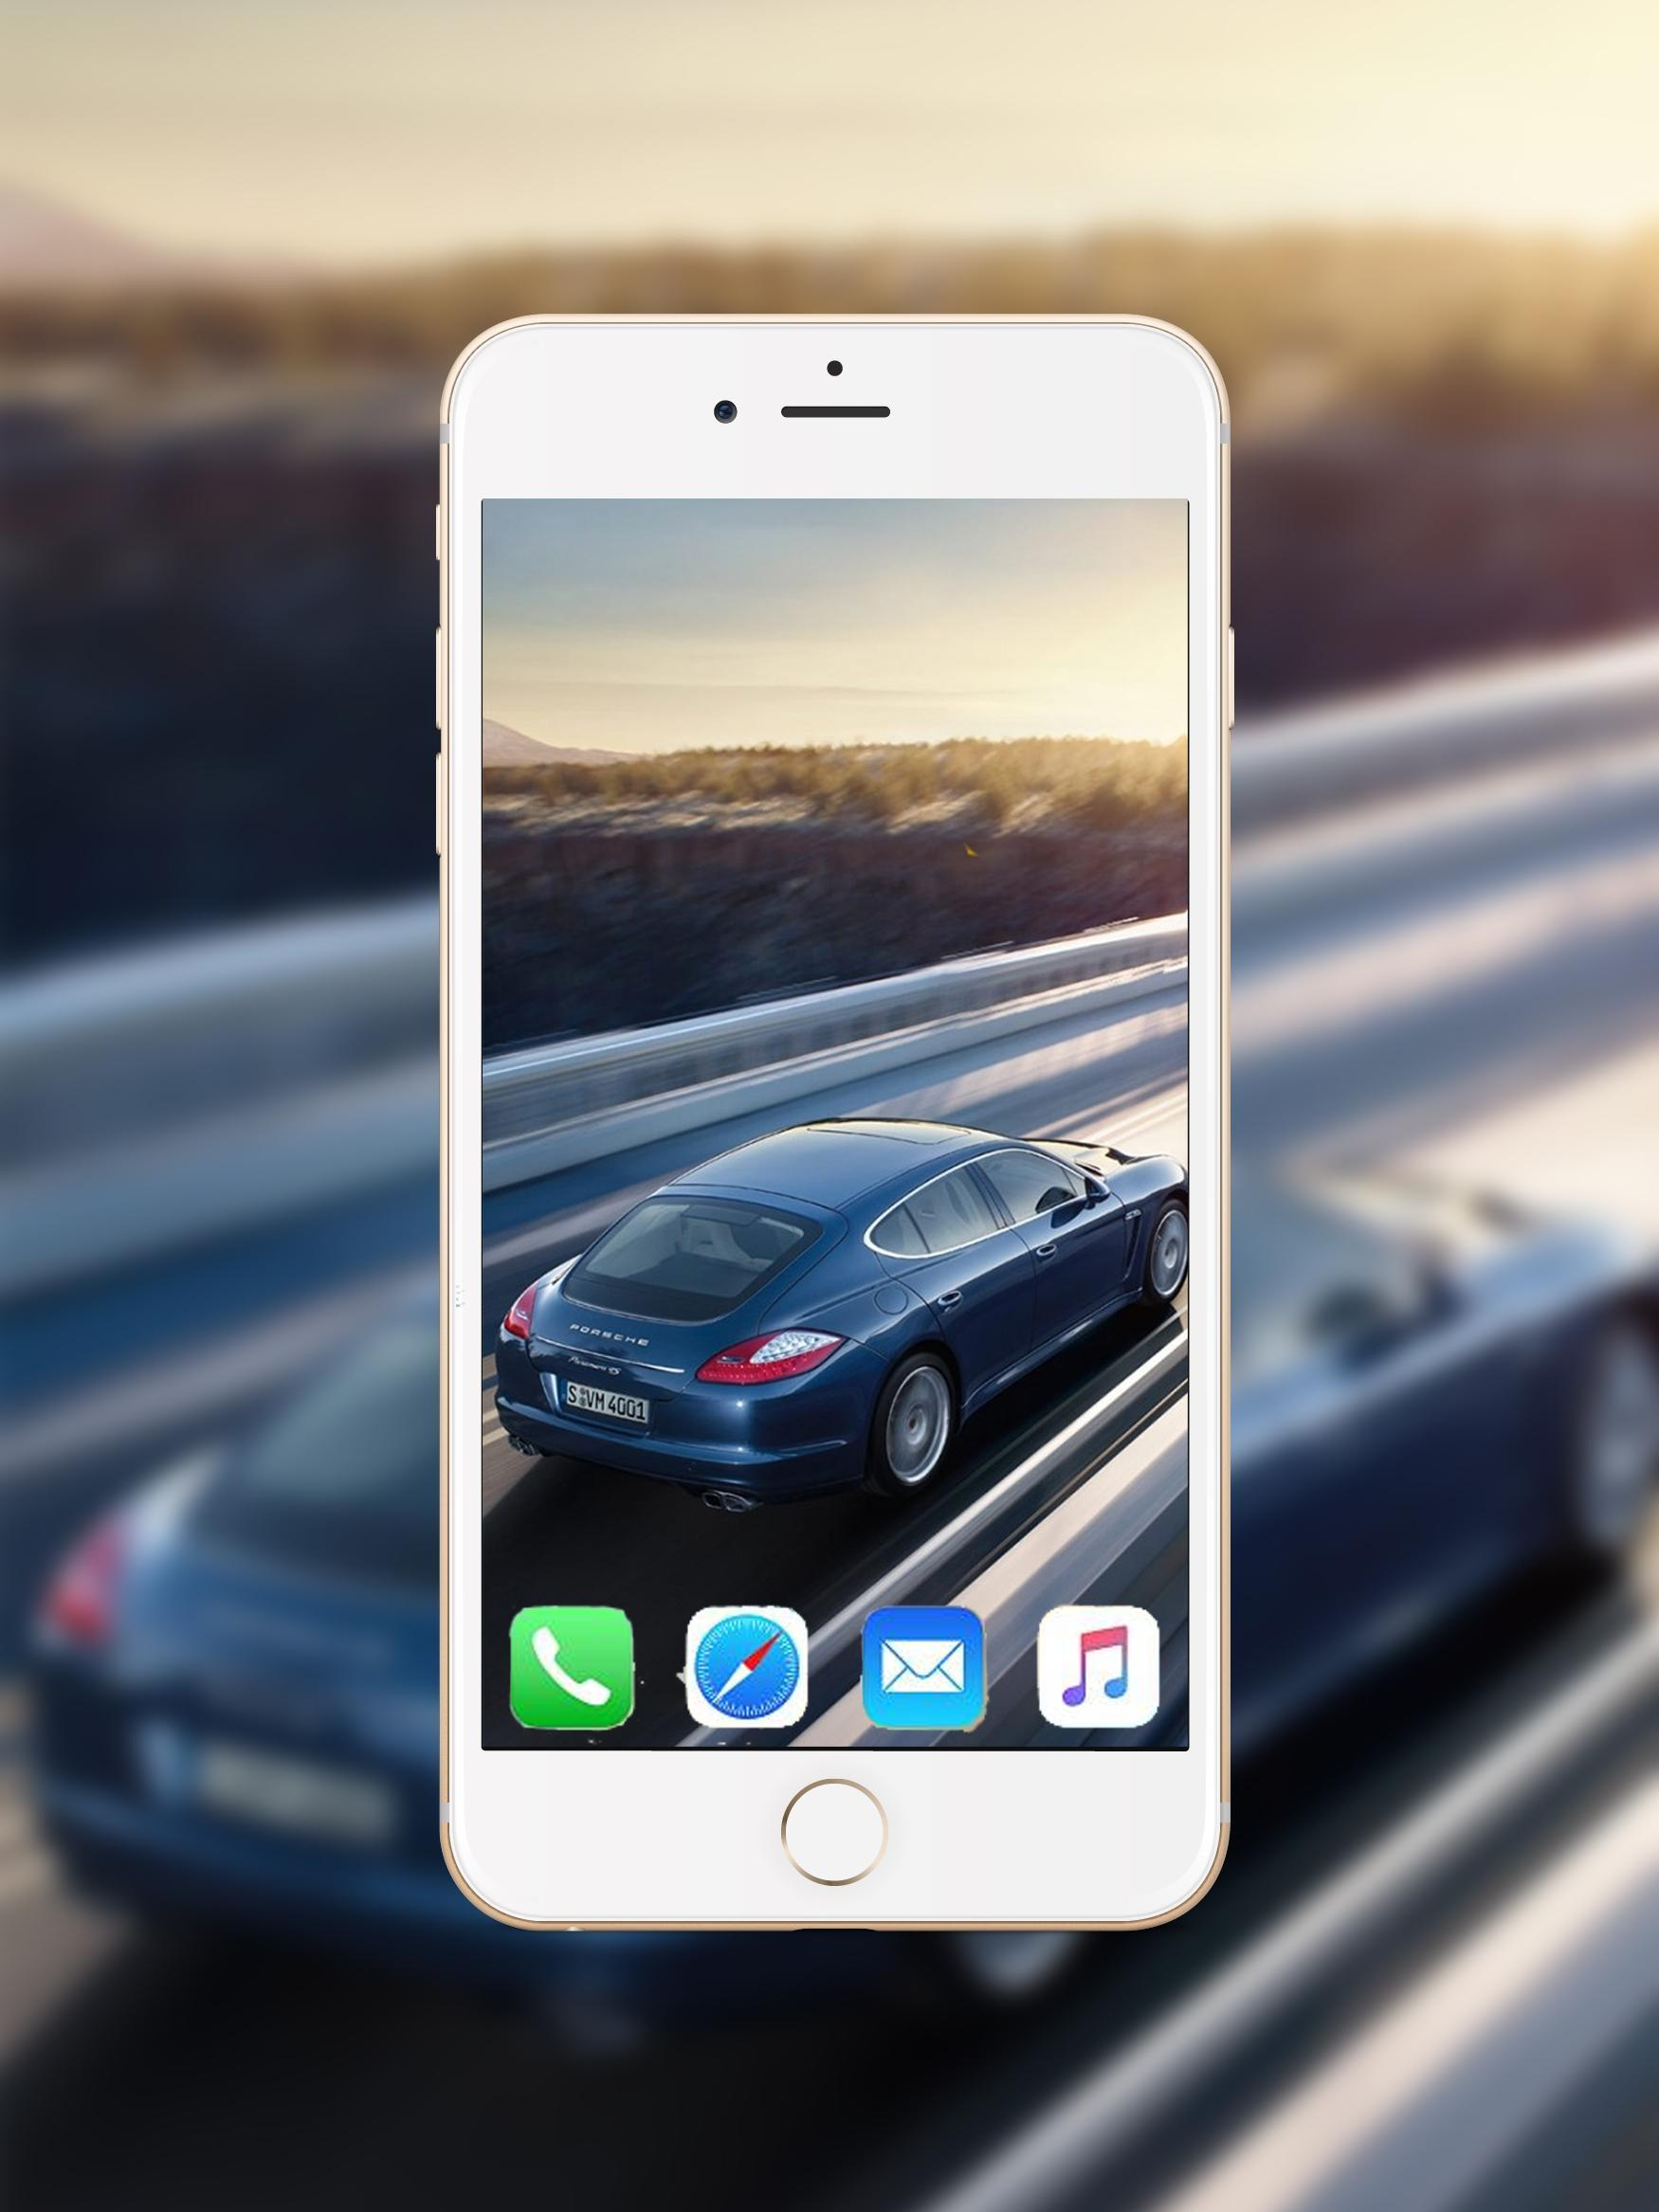 Porsche Panamera Wallpaper For Android Apk Download